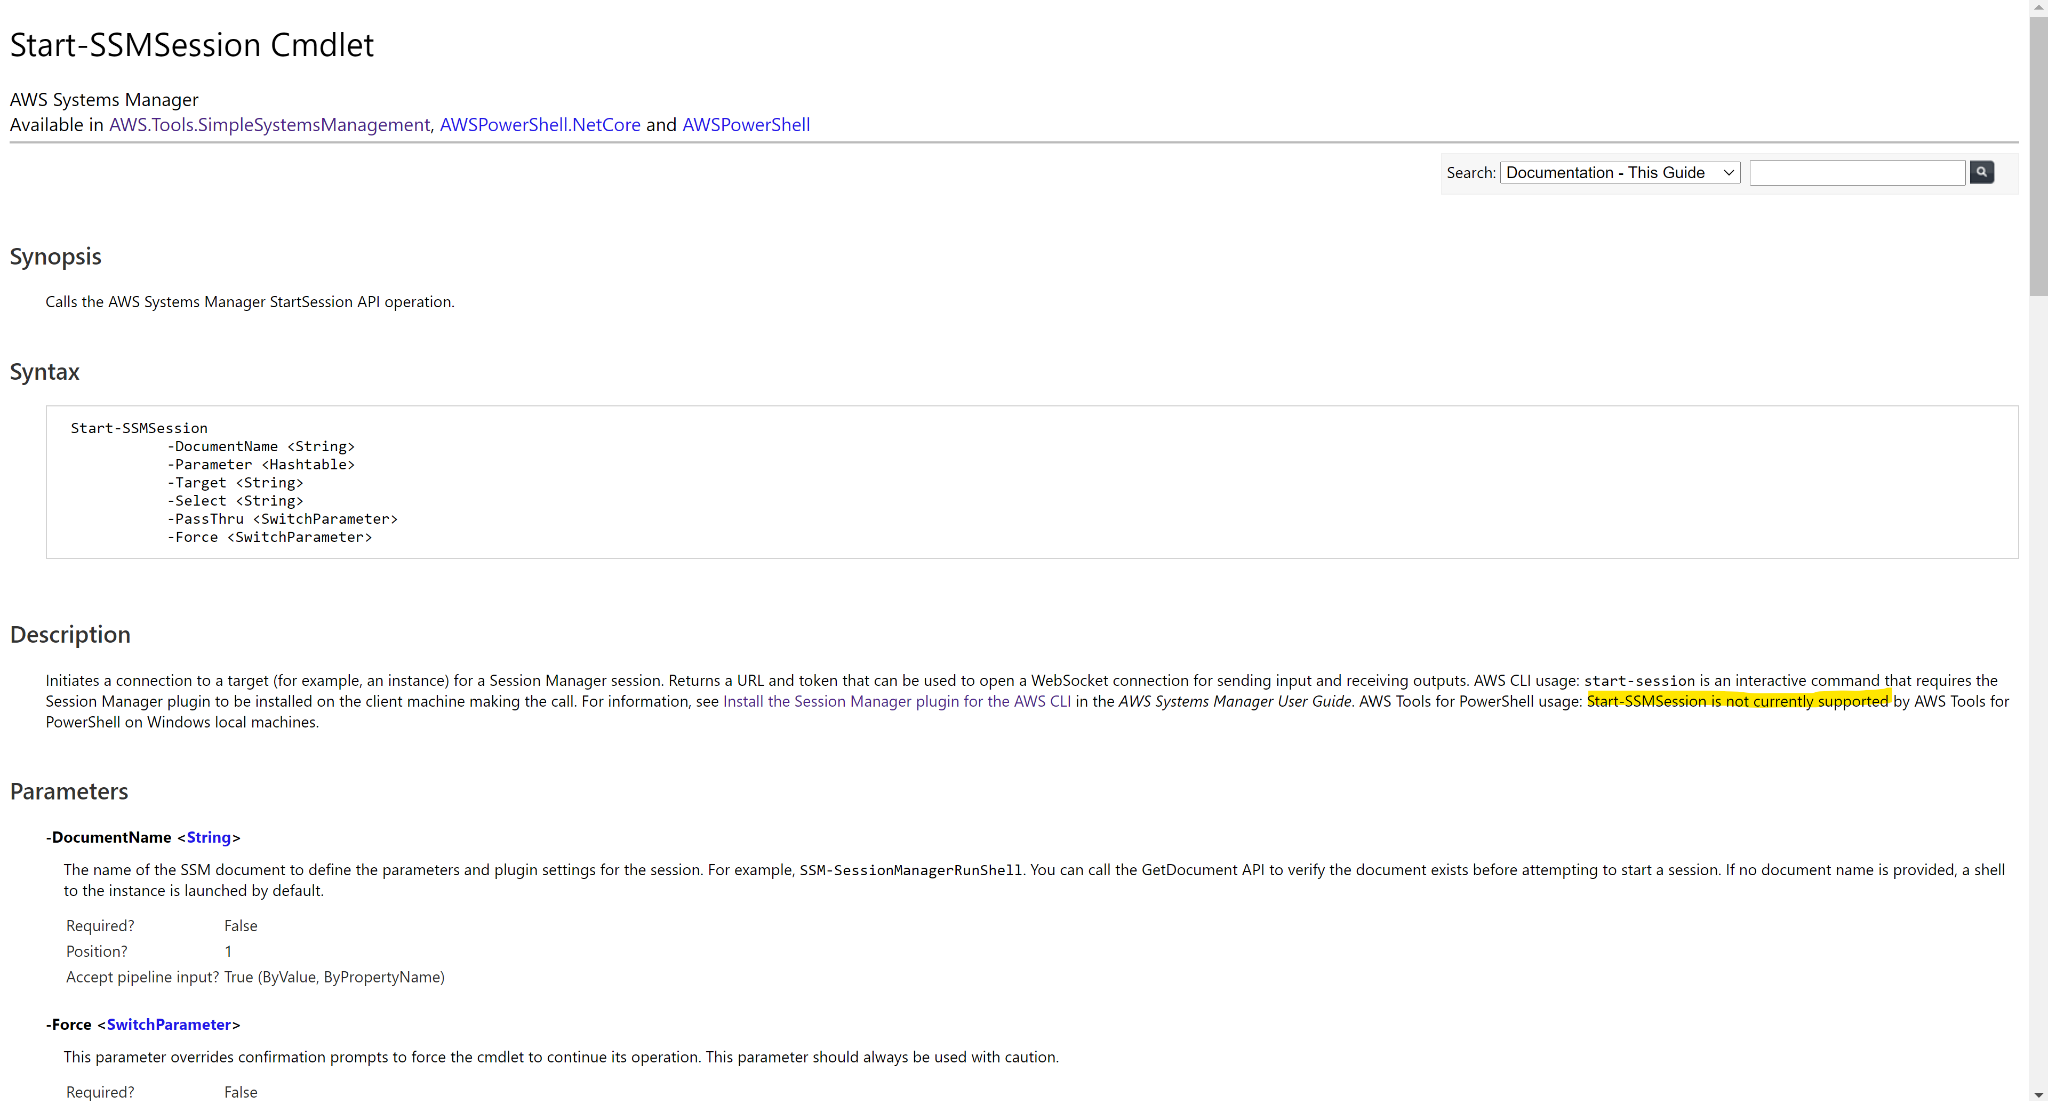 screenshot of Start-SSMSession PowerShell Command